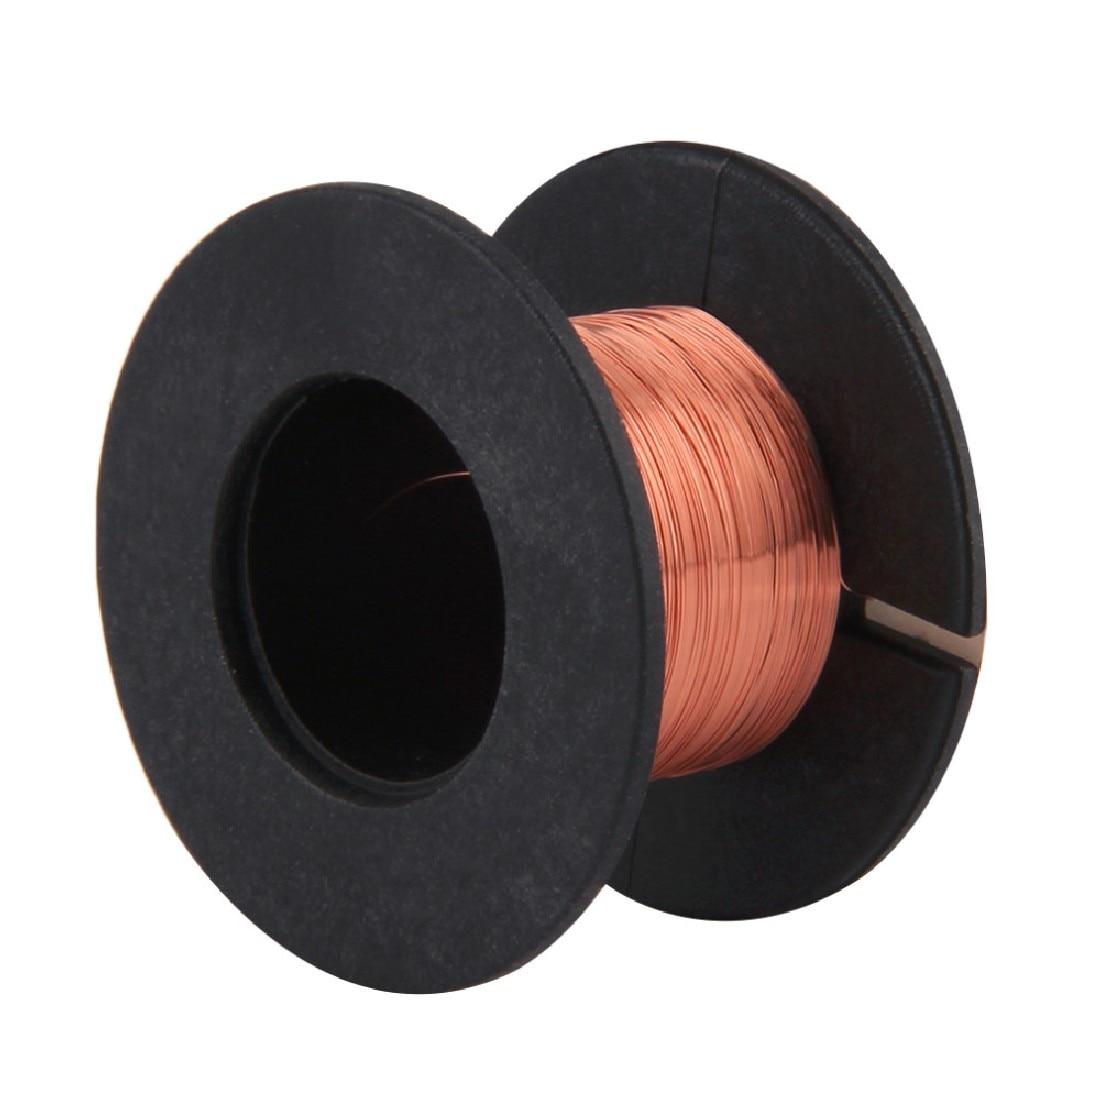 Weld Copper Soldering Solder 0.1MM PPA Enamelled Reel Wire For Welding Repair Maintenance High Quality